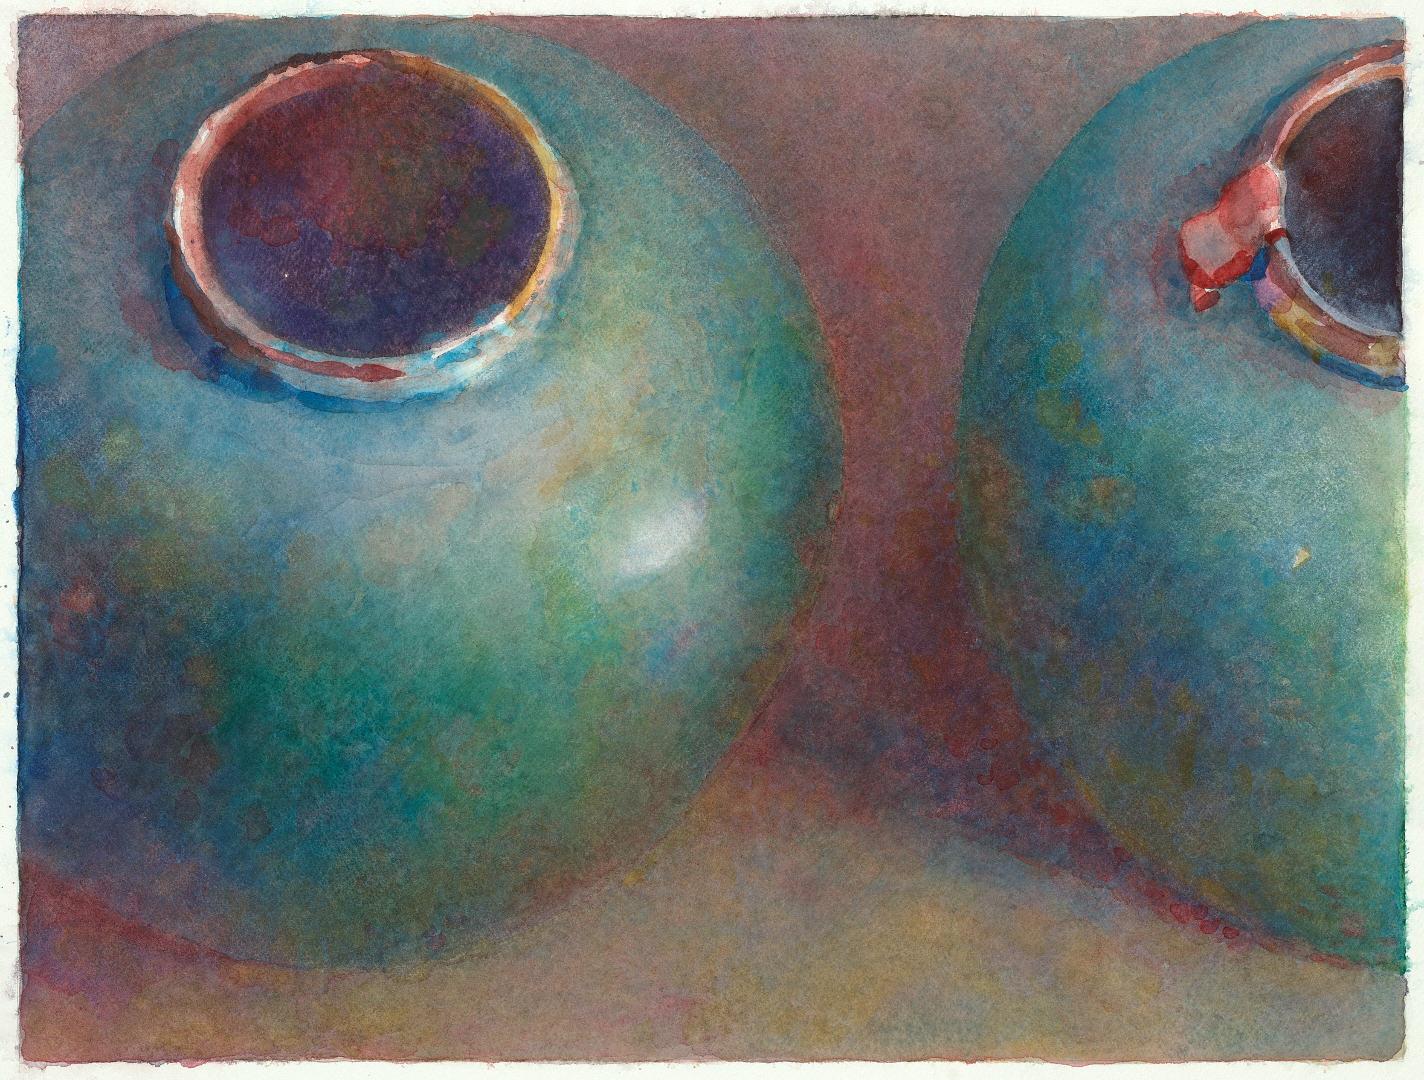 2008 Twee gemberpotten (34 X 45 cm) 11625w